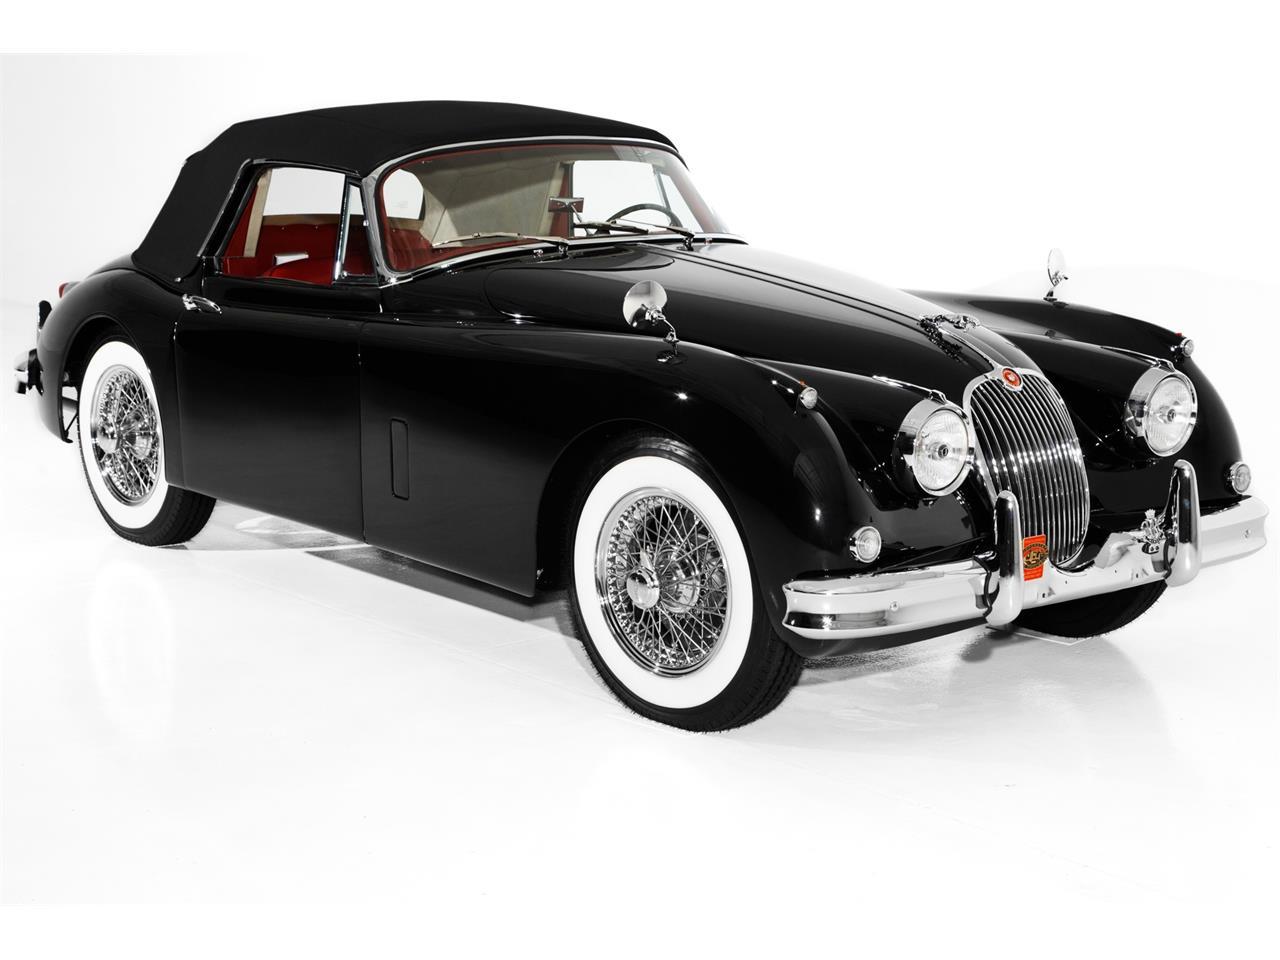 1959 Jaguar Xk150 Wiring Diagram Detailed Diagrams 1958 For Sale Classiccars Com Cc 1084126 Convertible